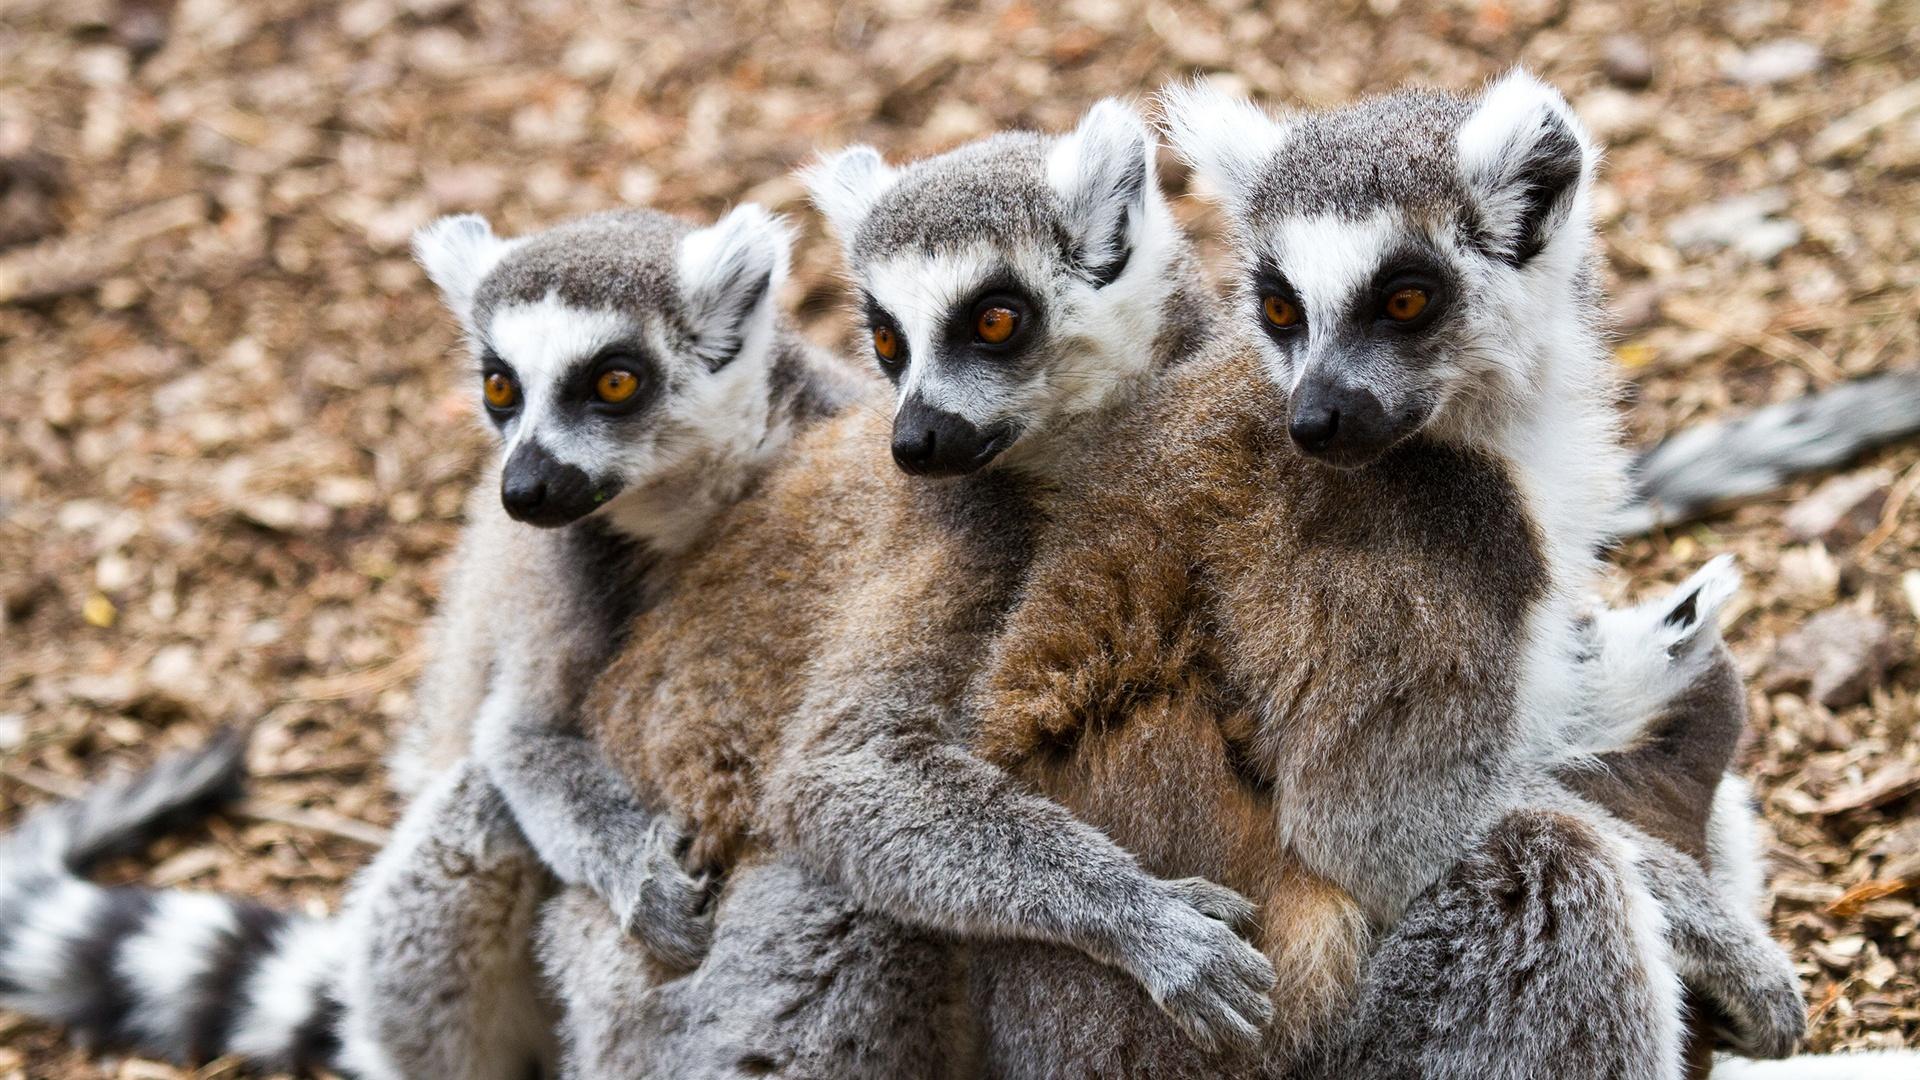 download wallpaper 3840x2160 lemur - photo #18